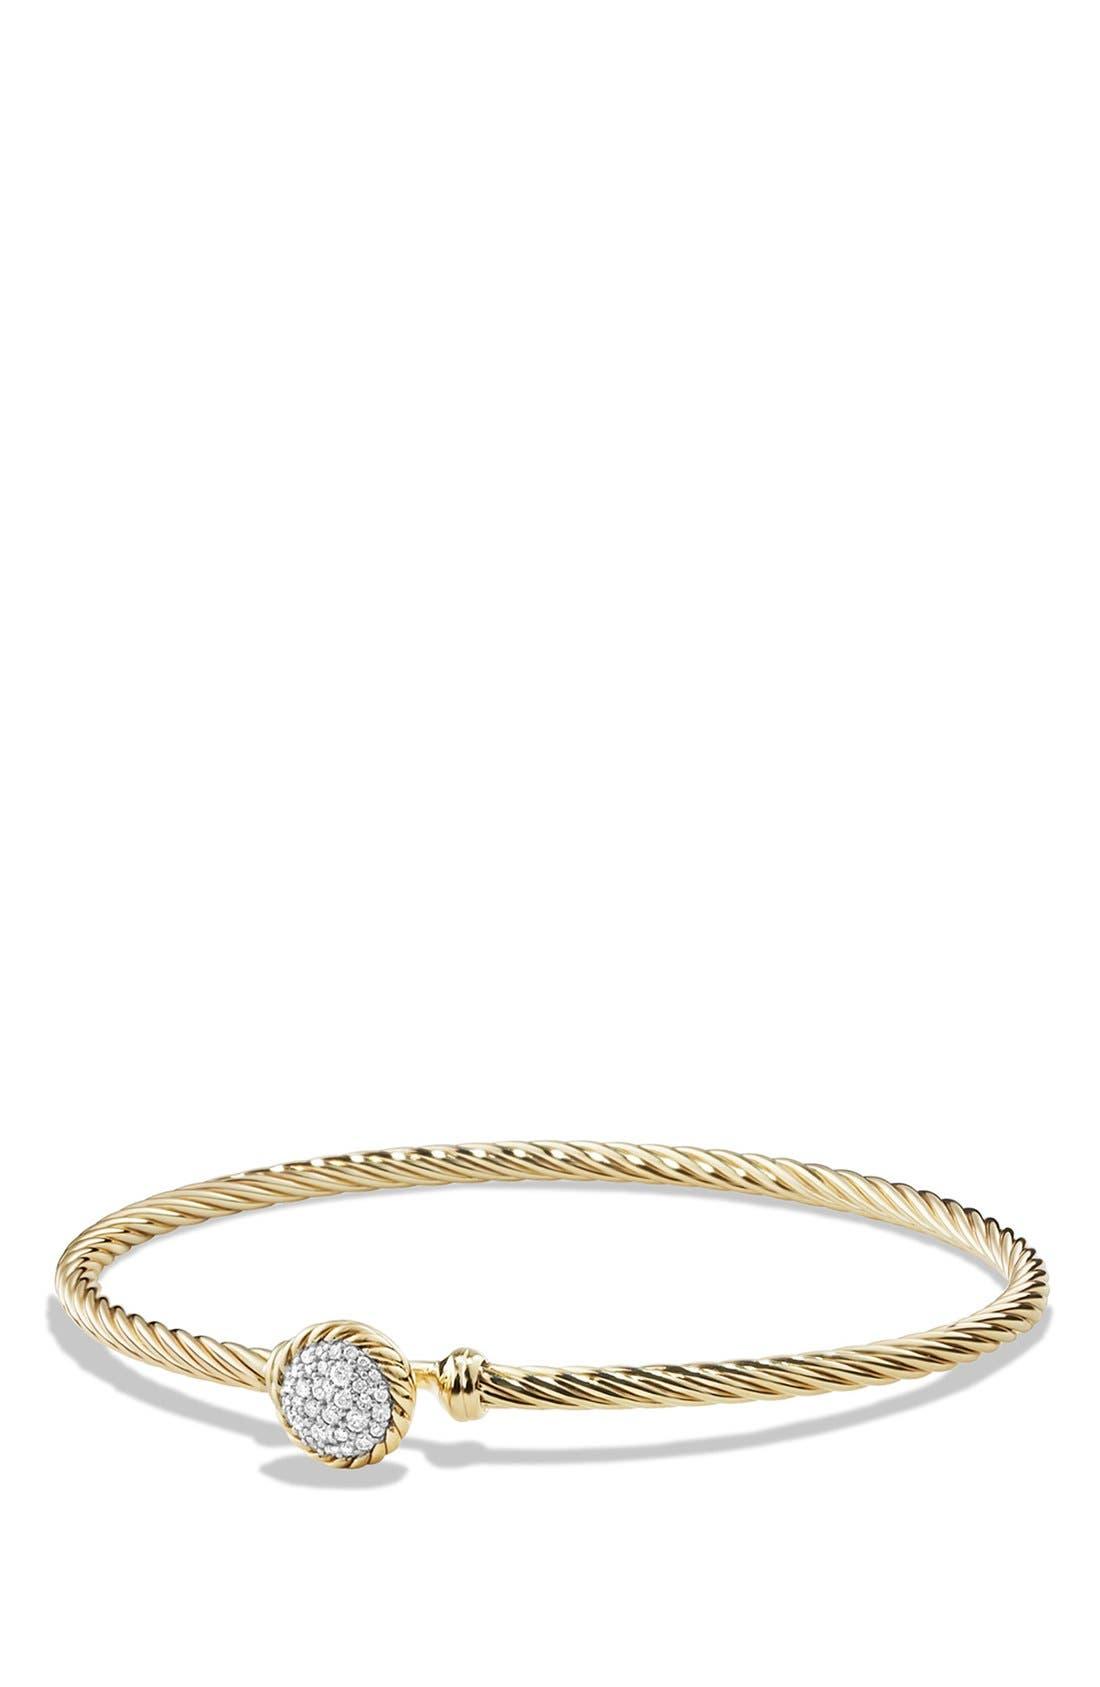 David Yurman 'Châtelaine' Bracelet with Diamonds in 18K Gold